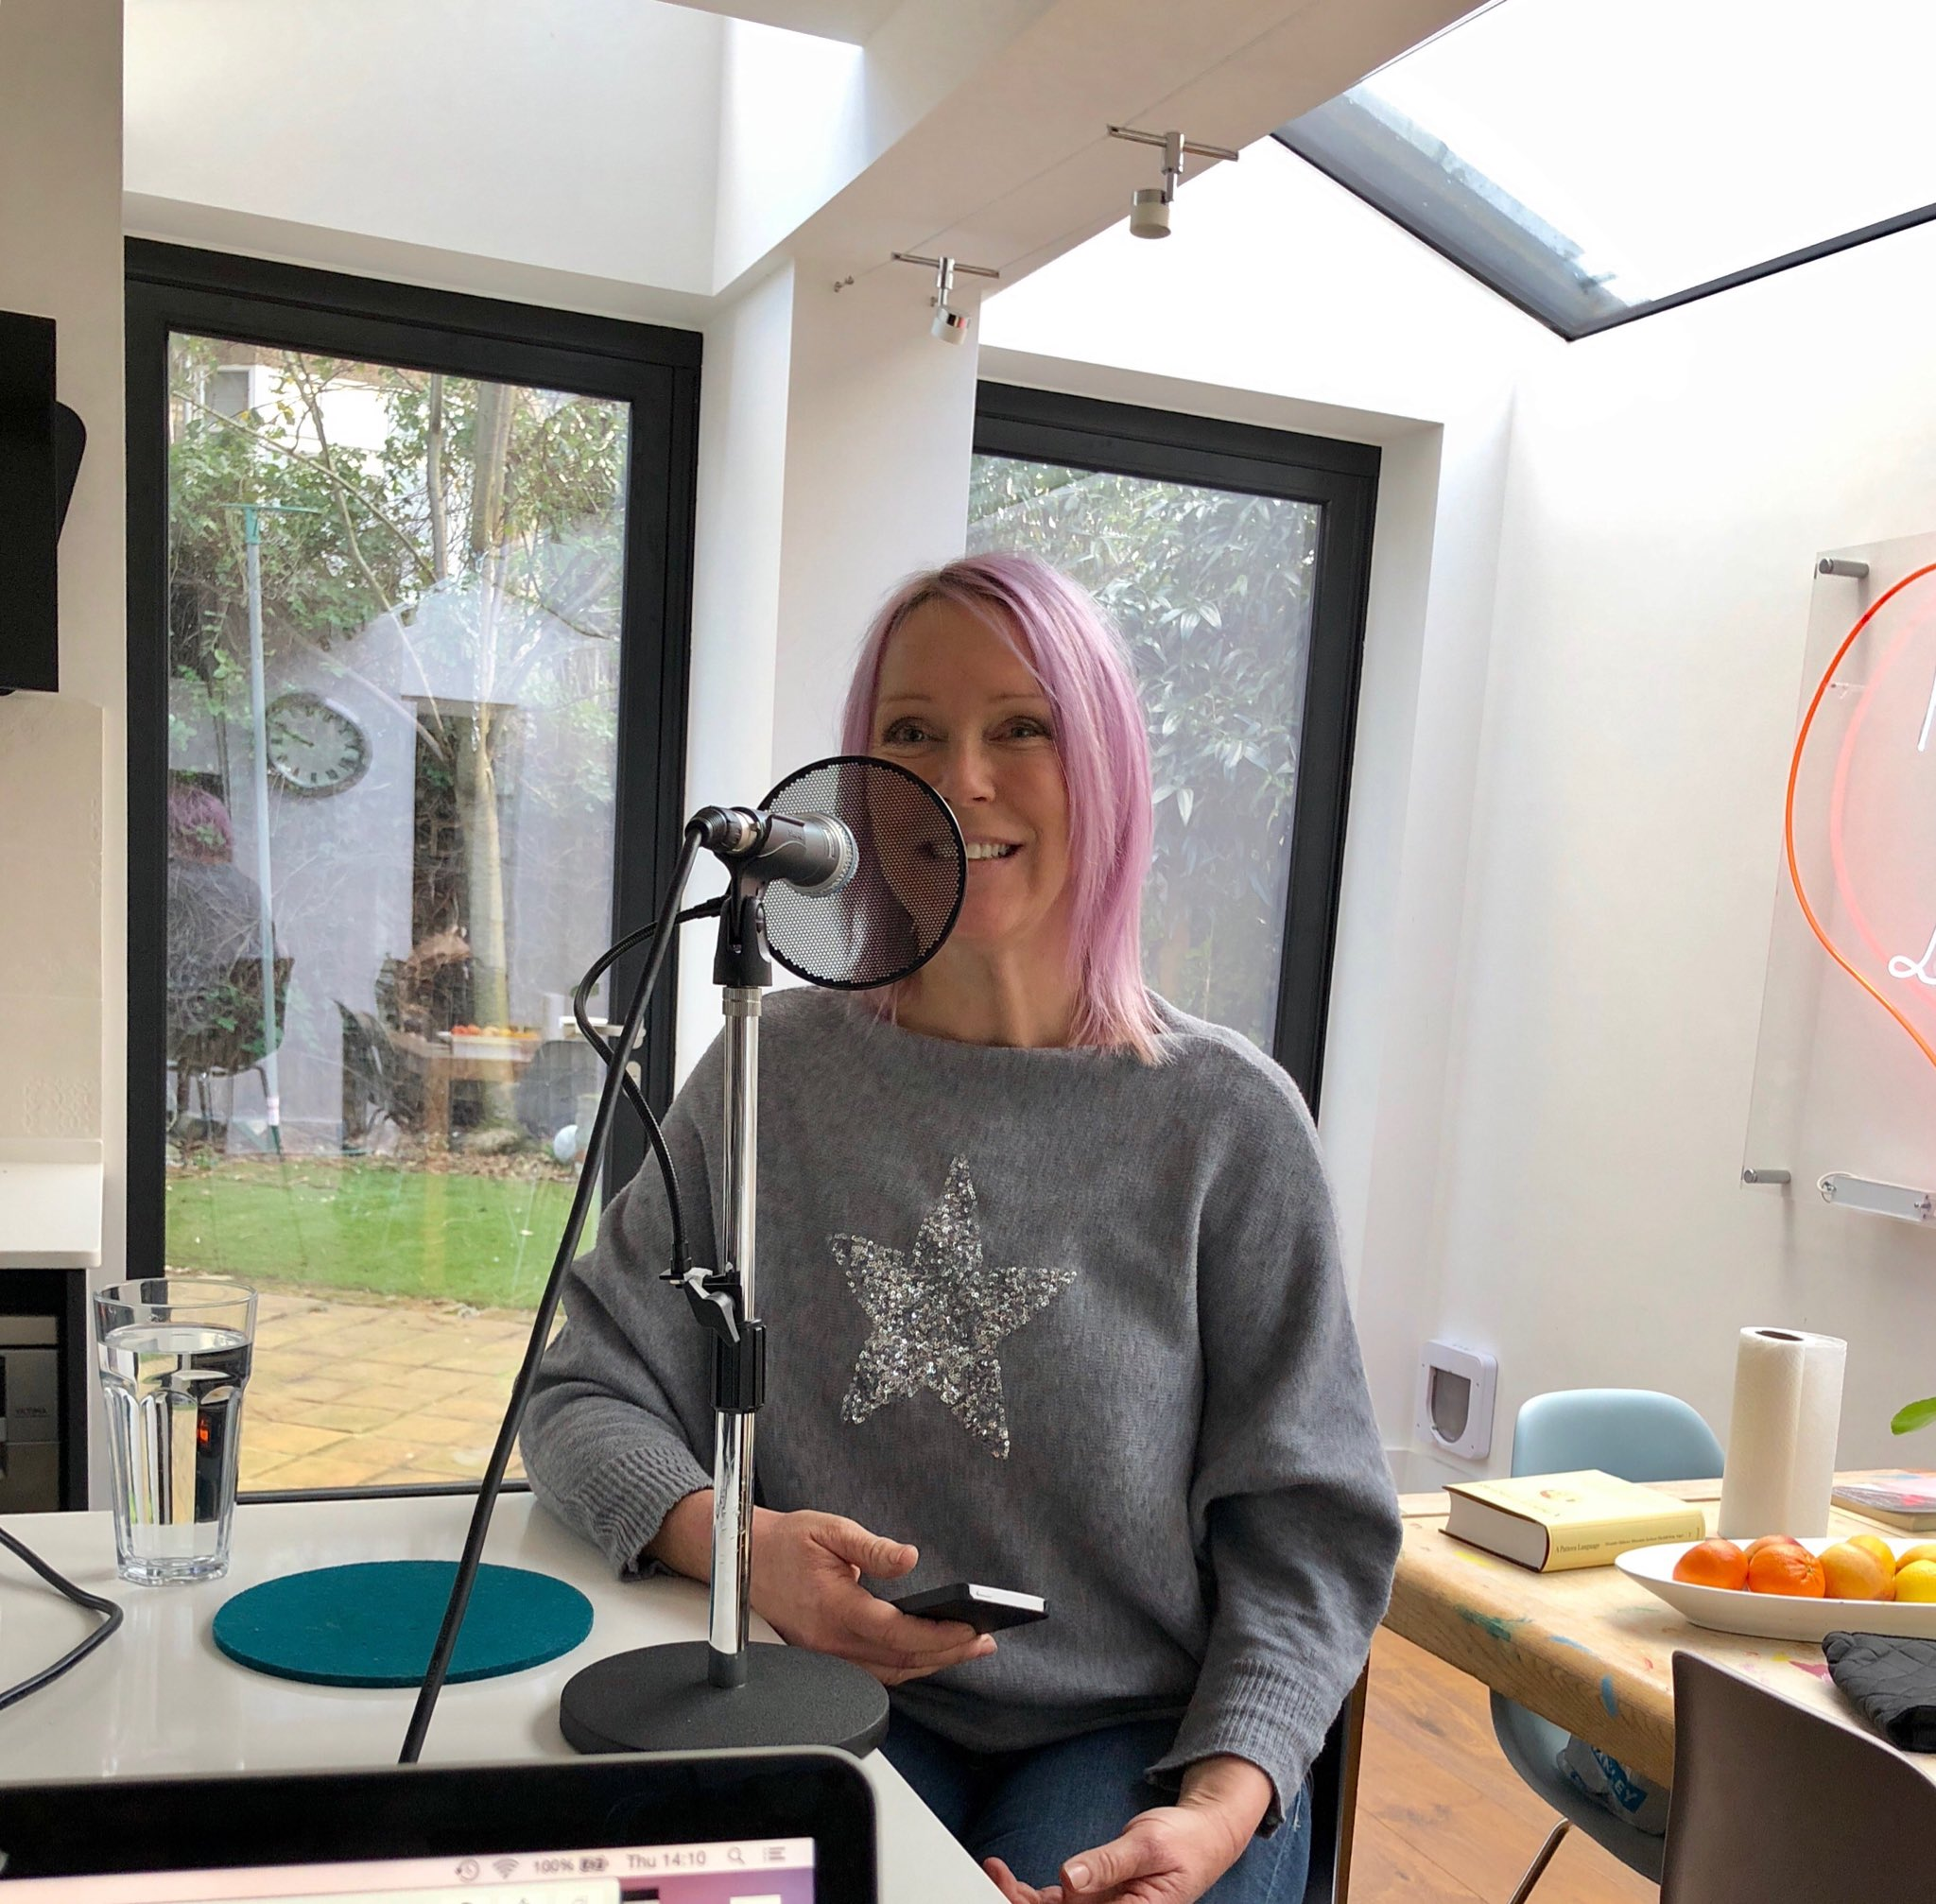 Look who we've got on the #DearLovejoy podcast. @HellsBellsy COMING SOON https://t.co/GRdpTHw6oG